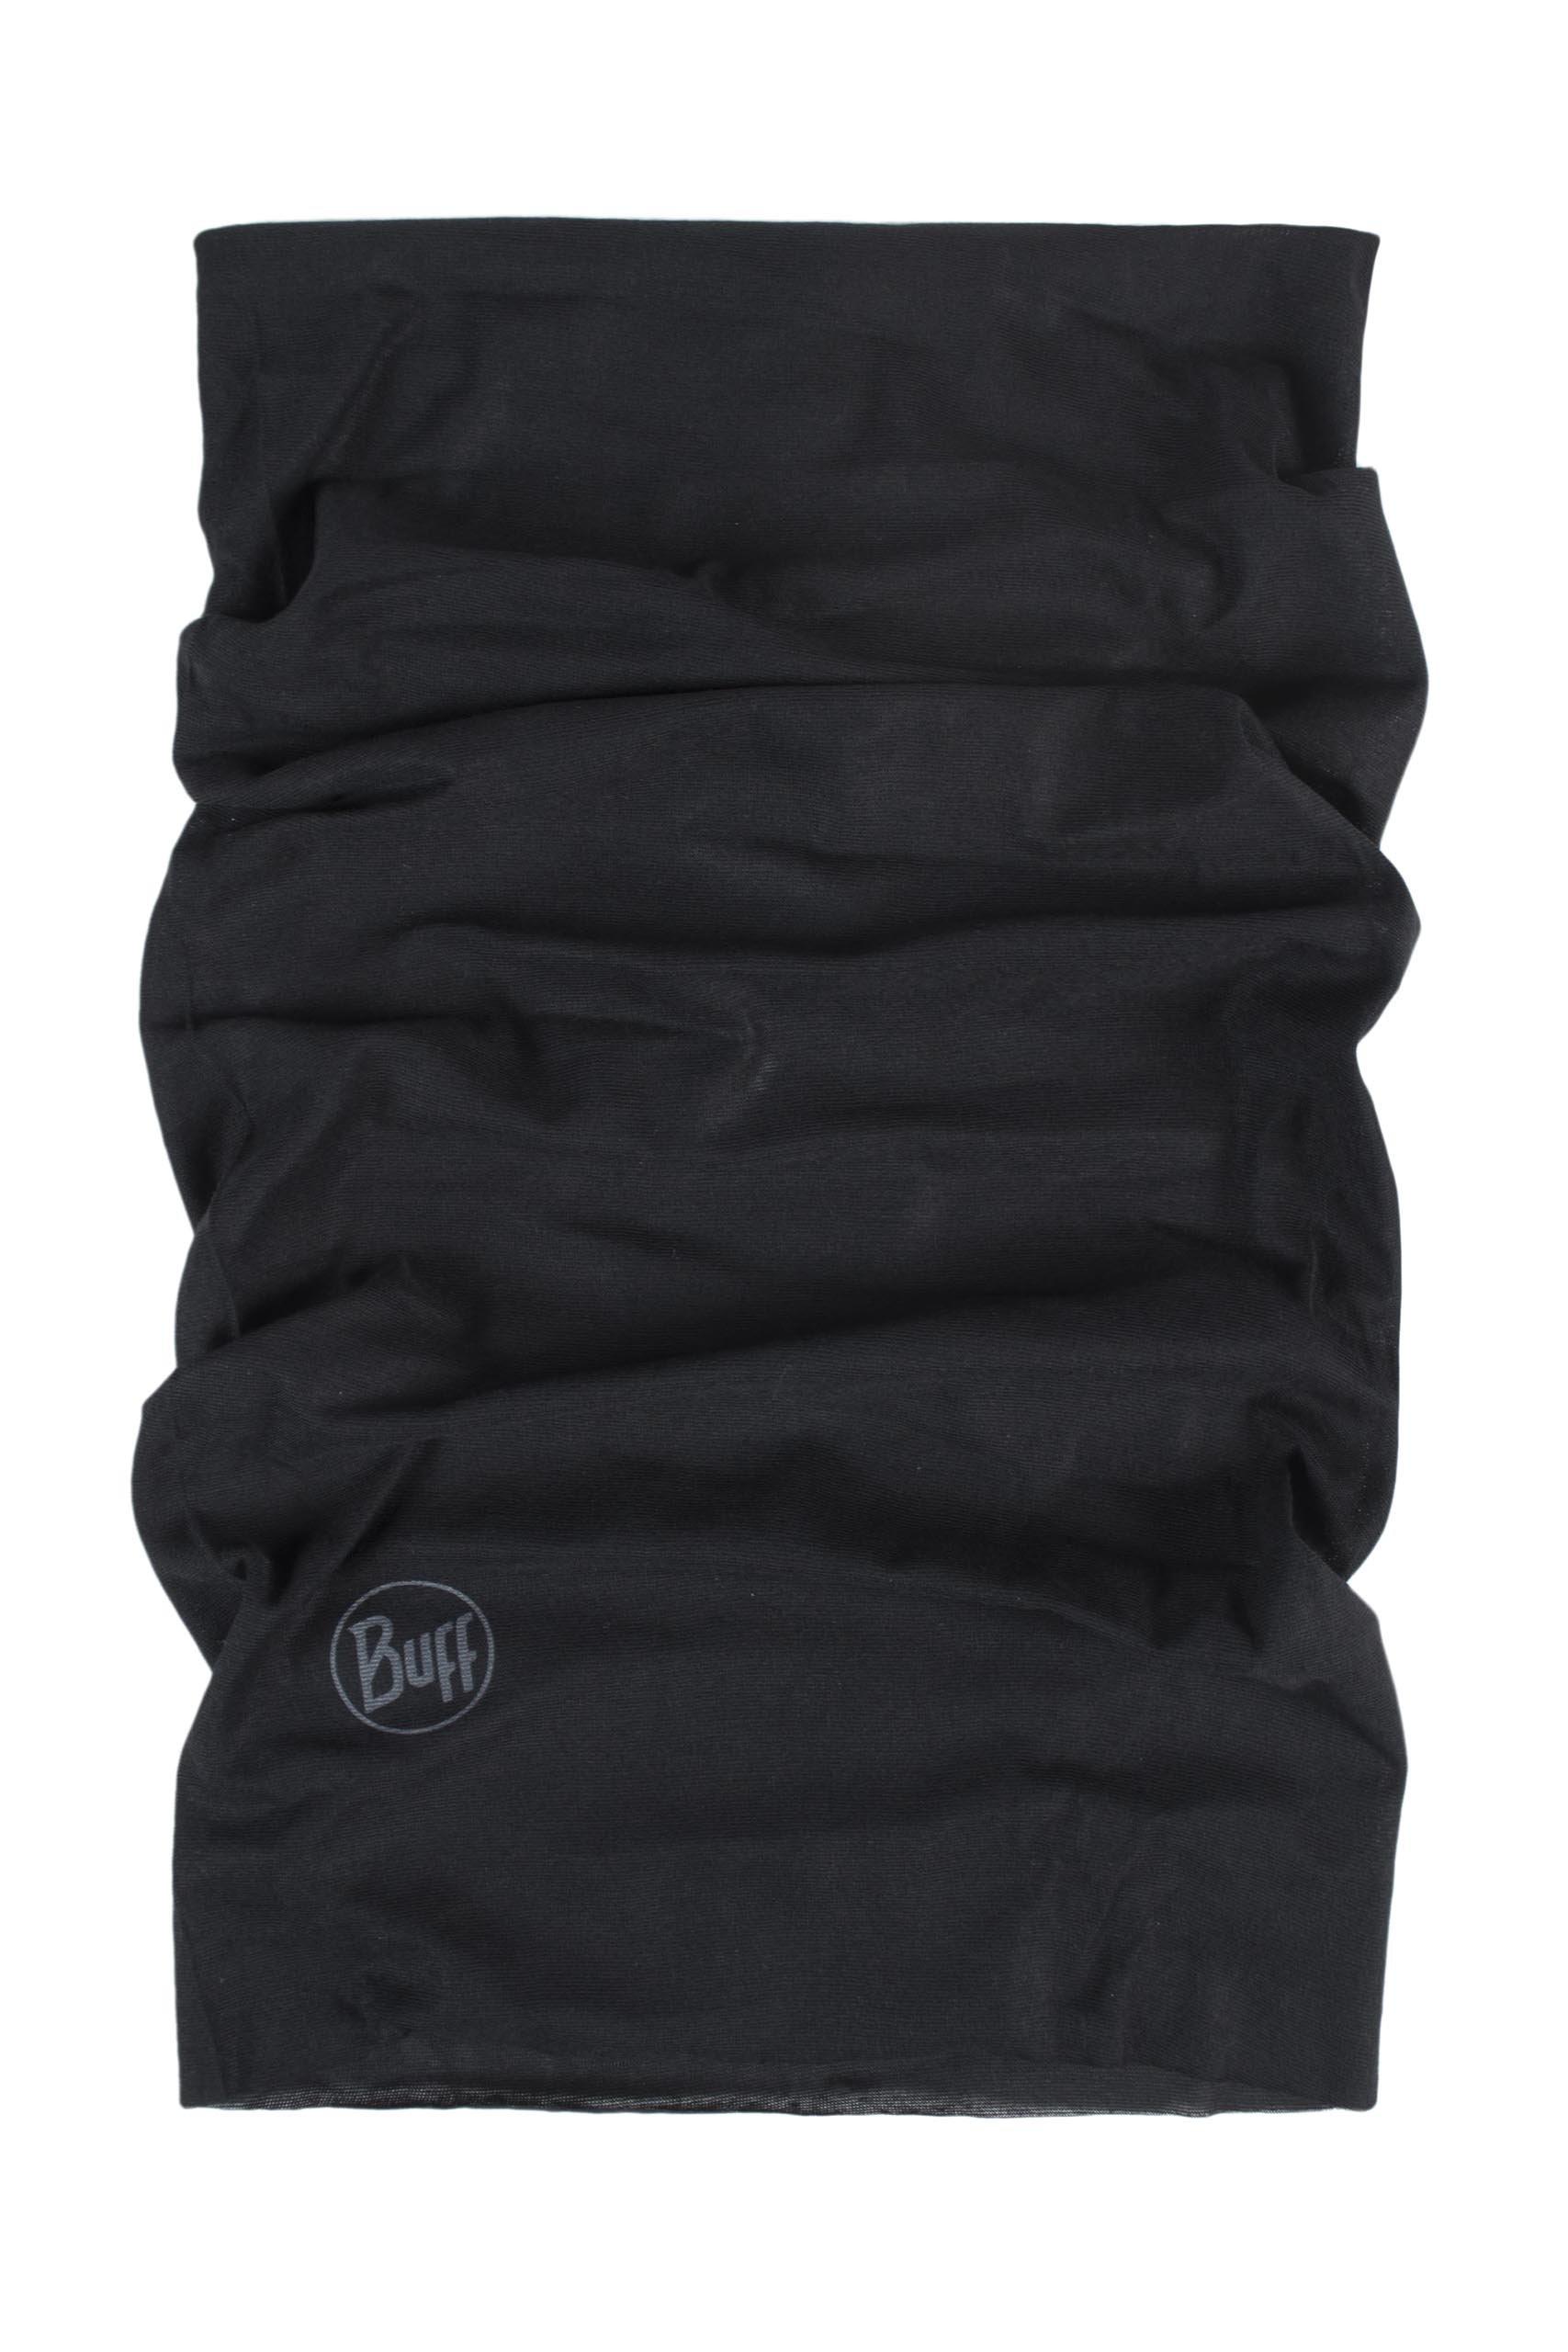 Buff Black - AW16 - One - Black by Buff (Image #1)